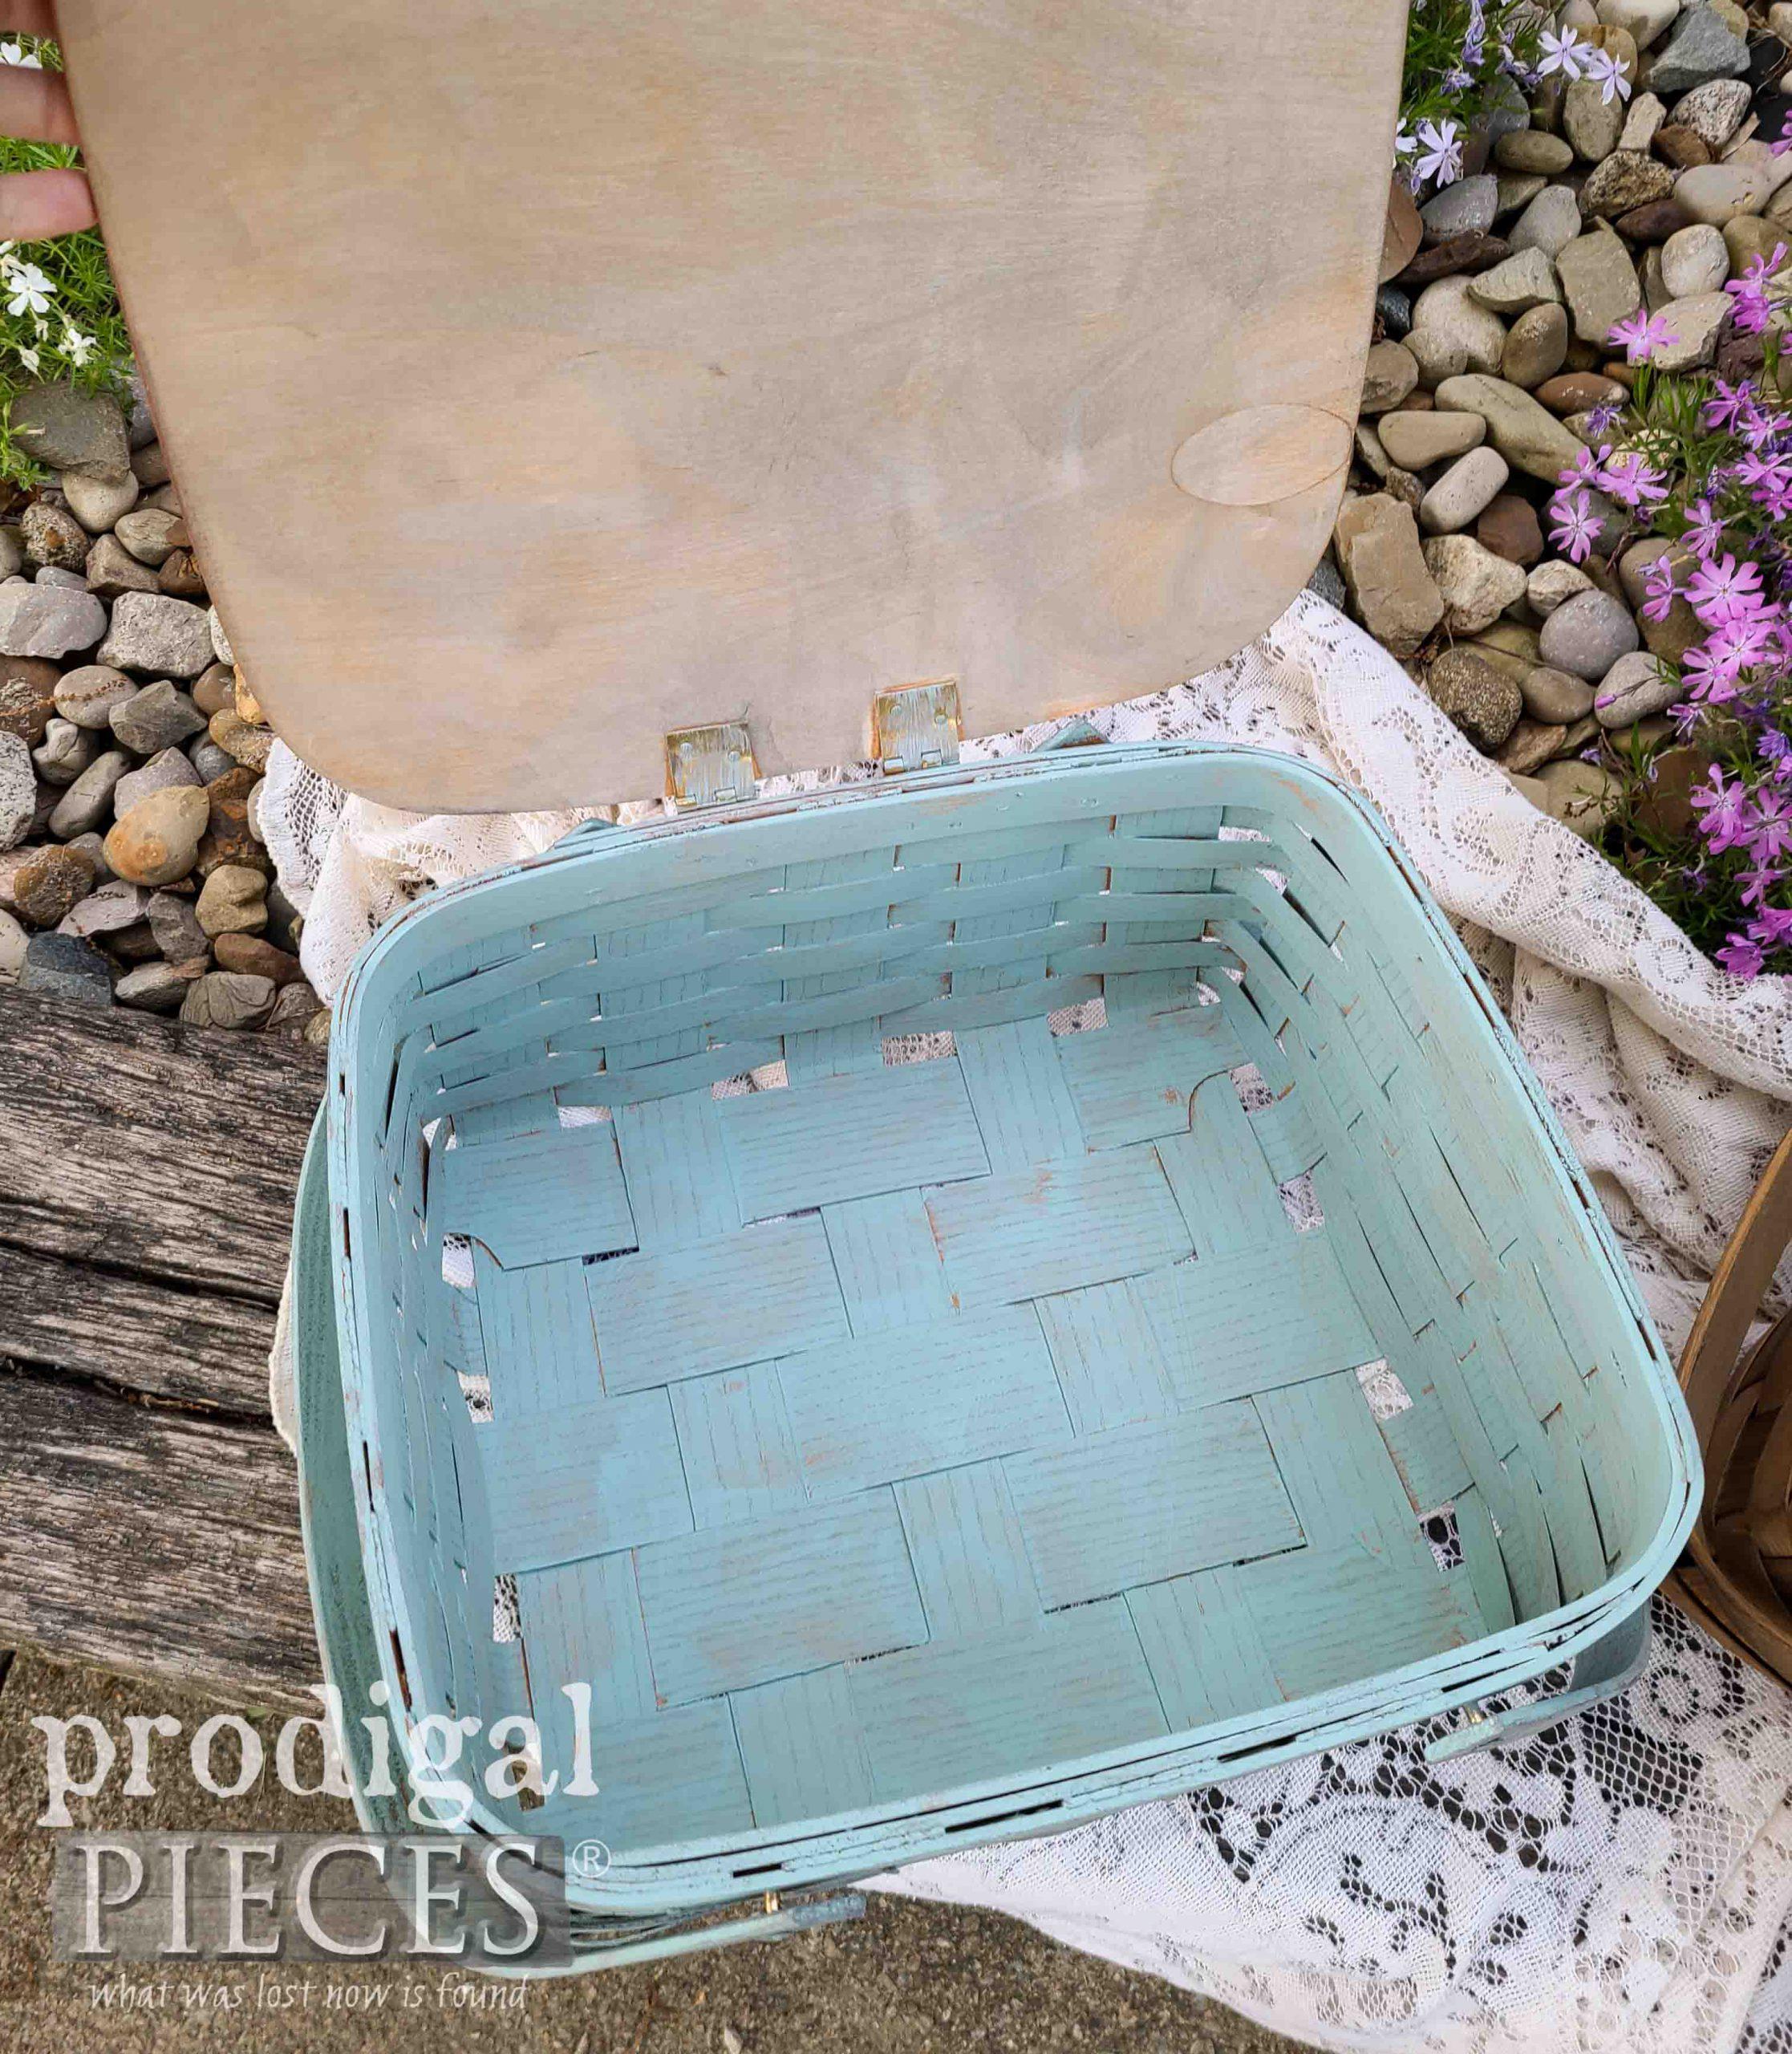 Inside Blue Picnic Basket by Prodigal Pieces | prodigalpieces.com #prodigalpieces #home